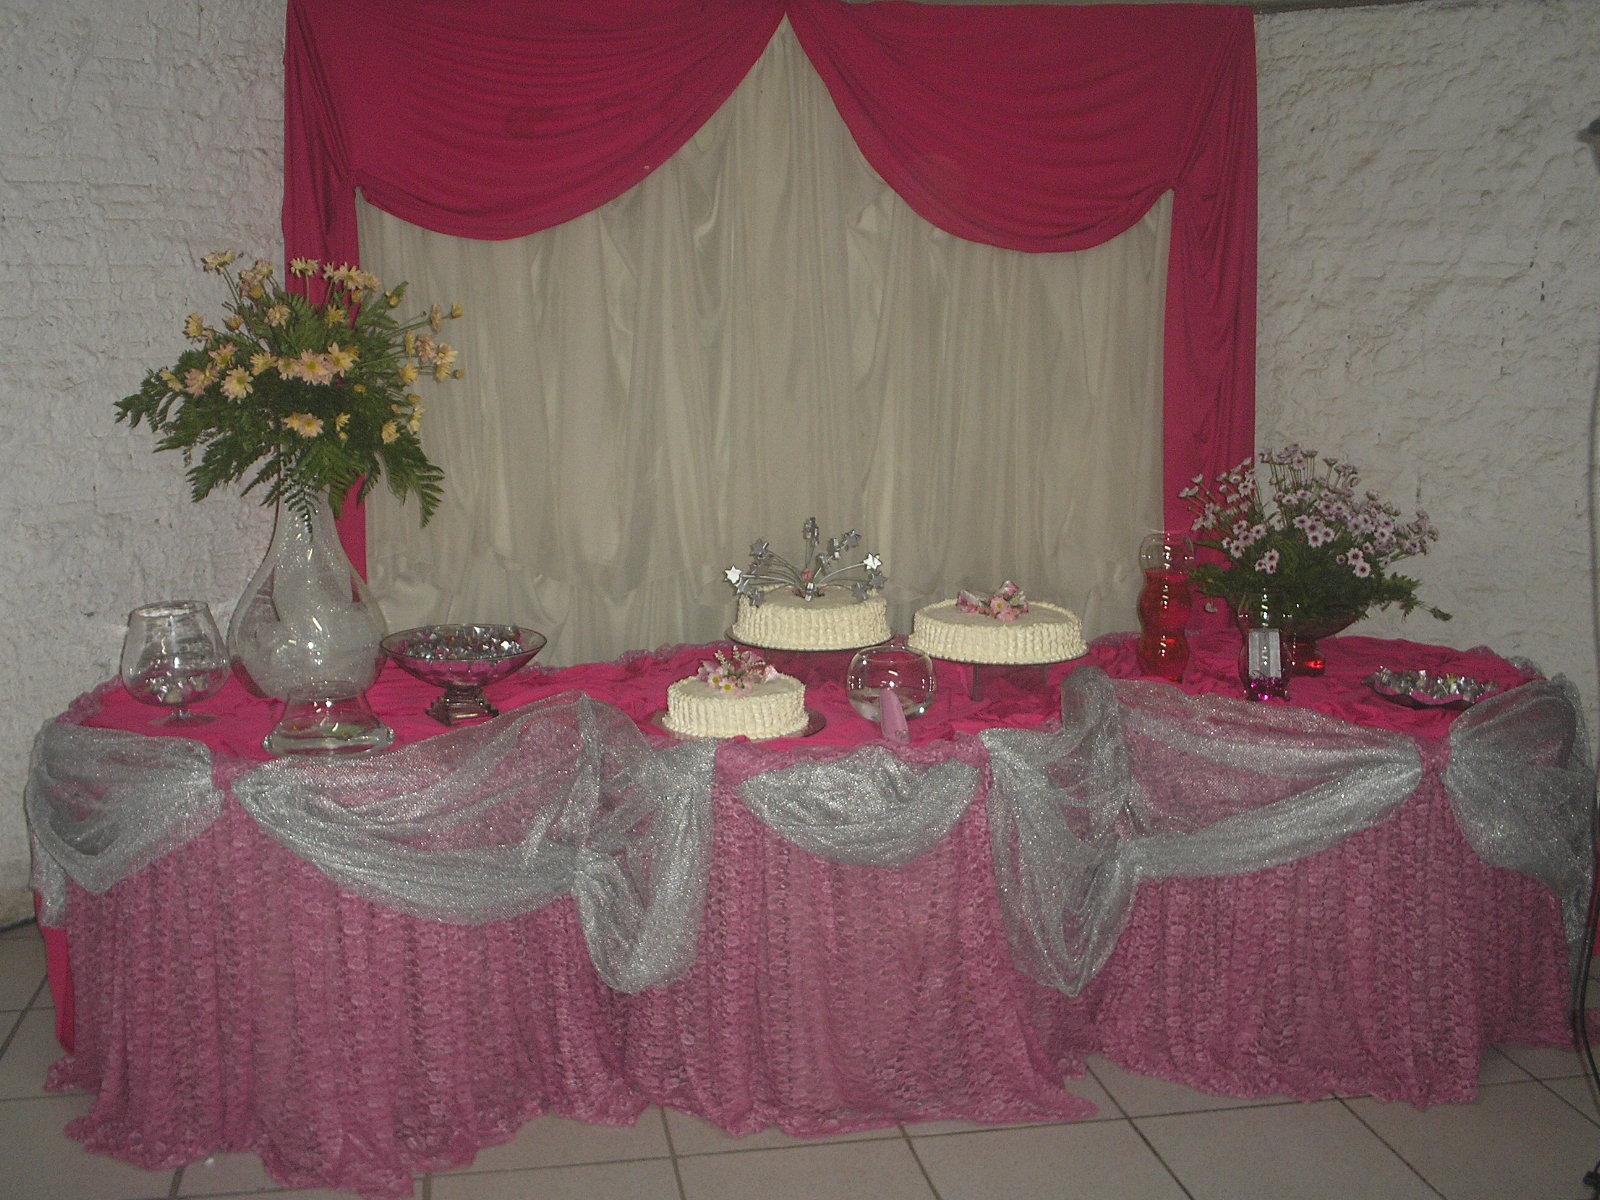 festa-de-15-anos-para-decoracao